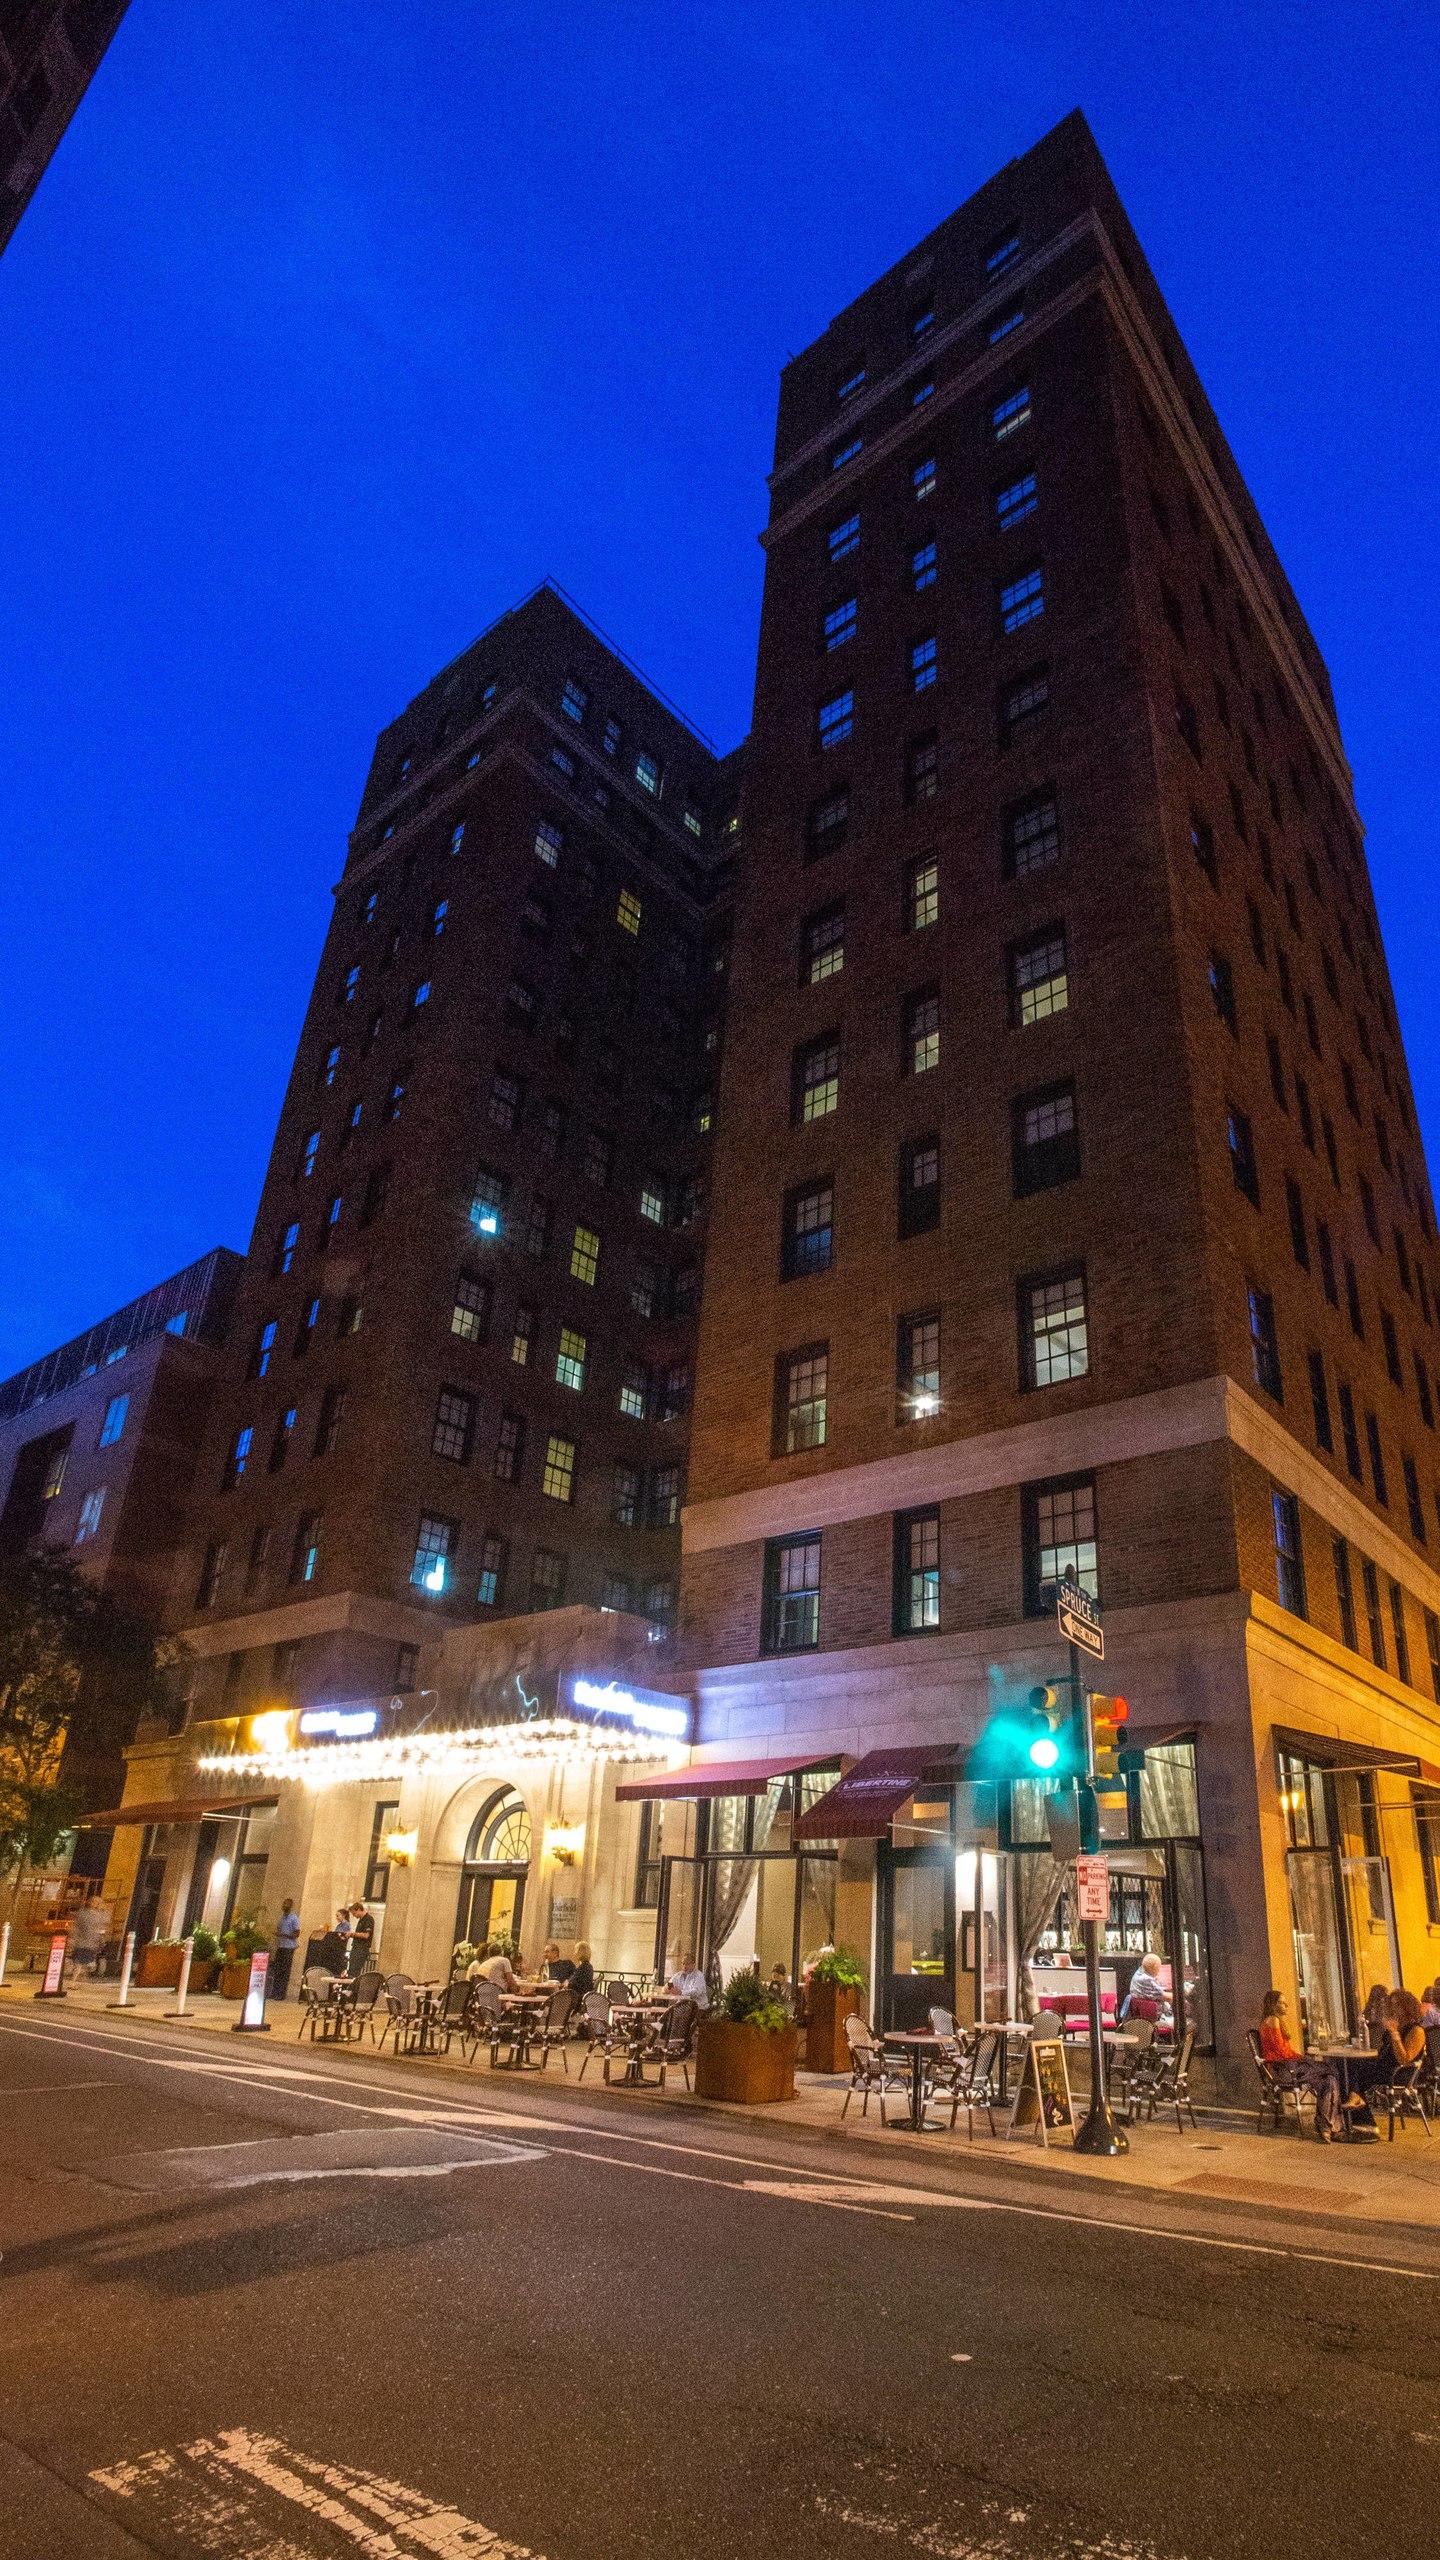 Fairfield Inn & Suites by Marriott Philadelphia Downtown/Center City image 3